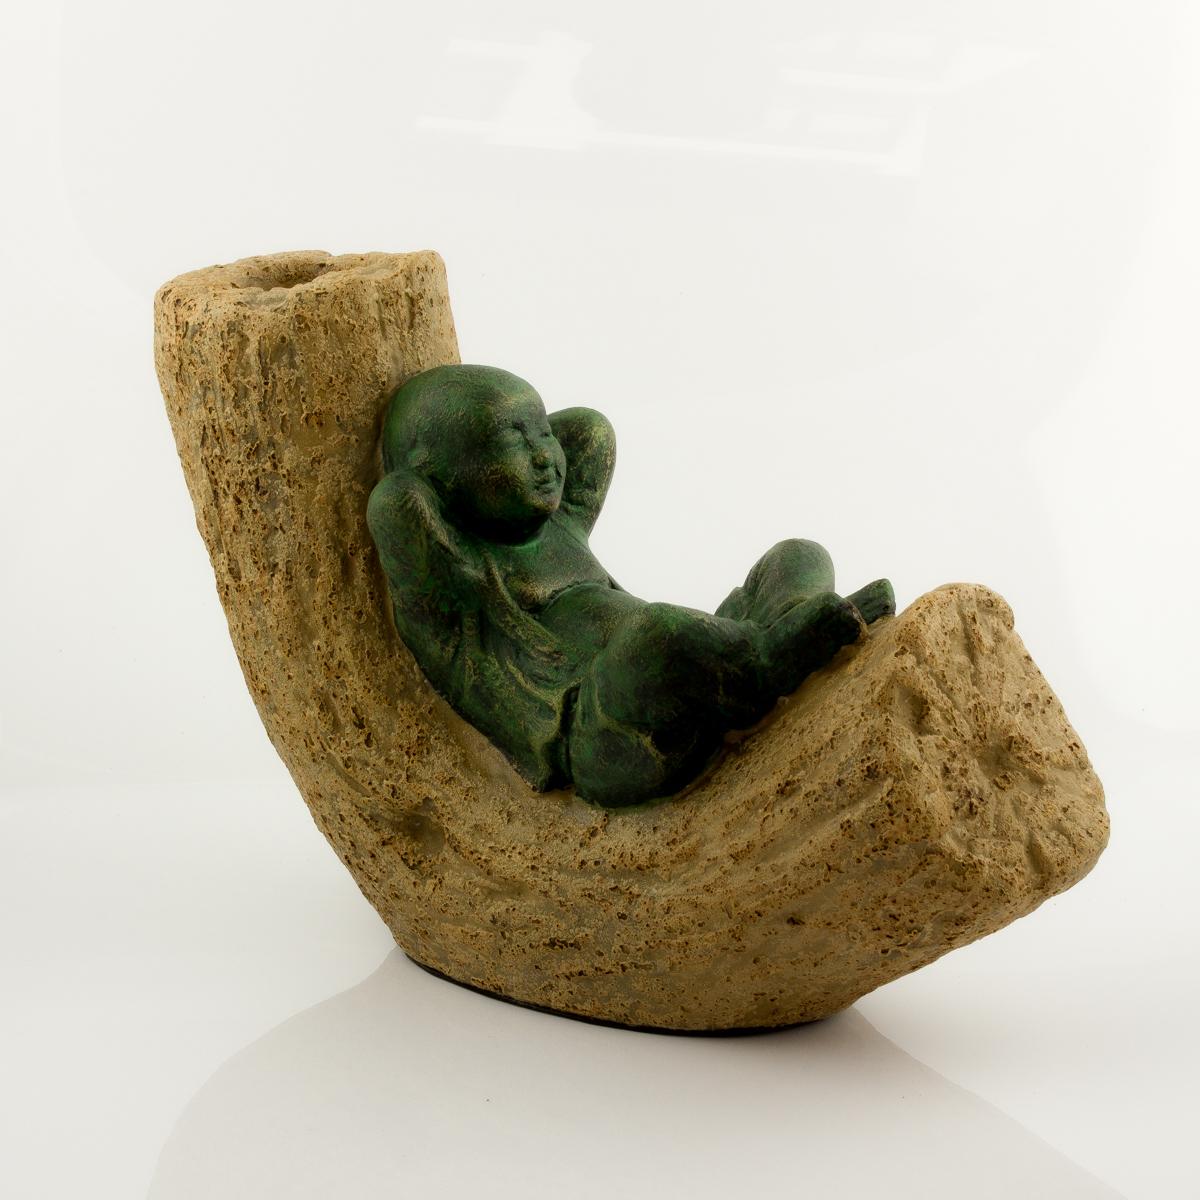 Figura Shaolin Wood Relax según imagen